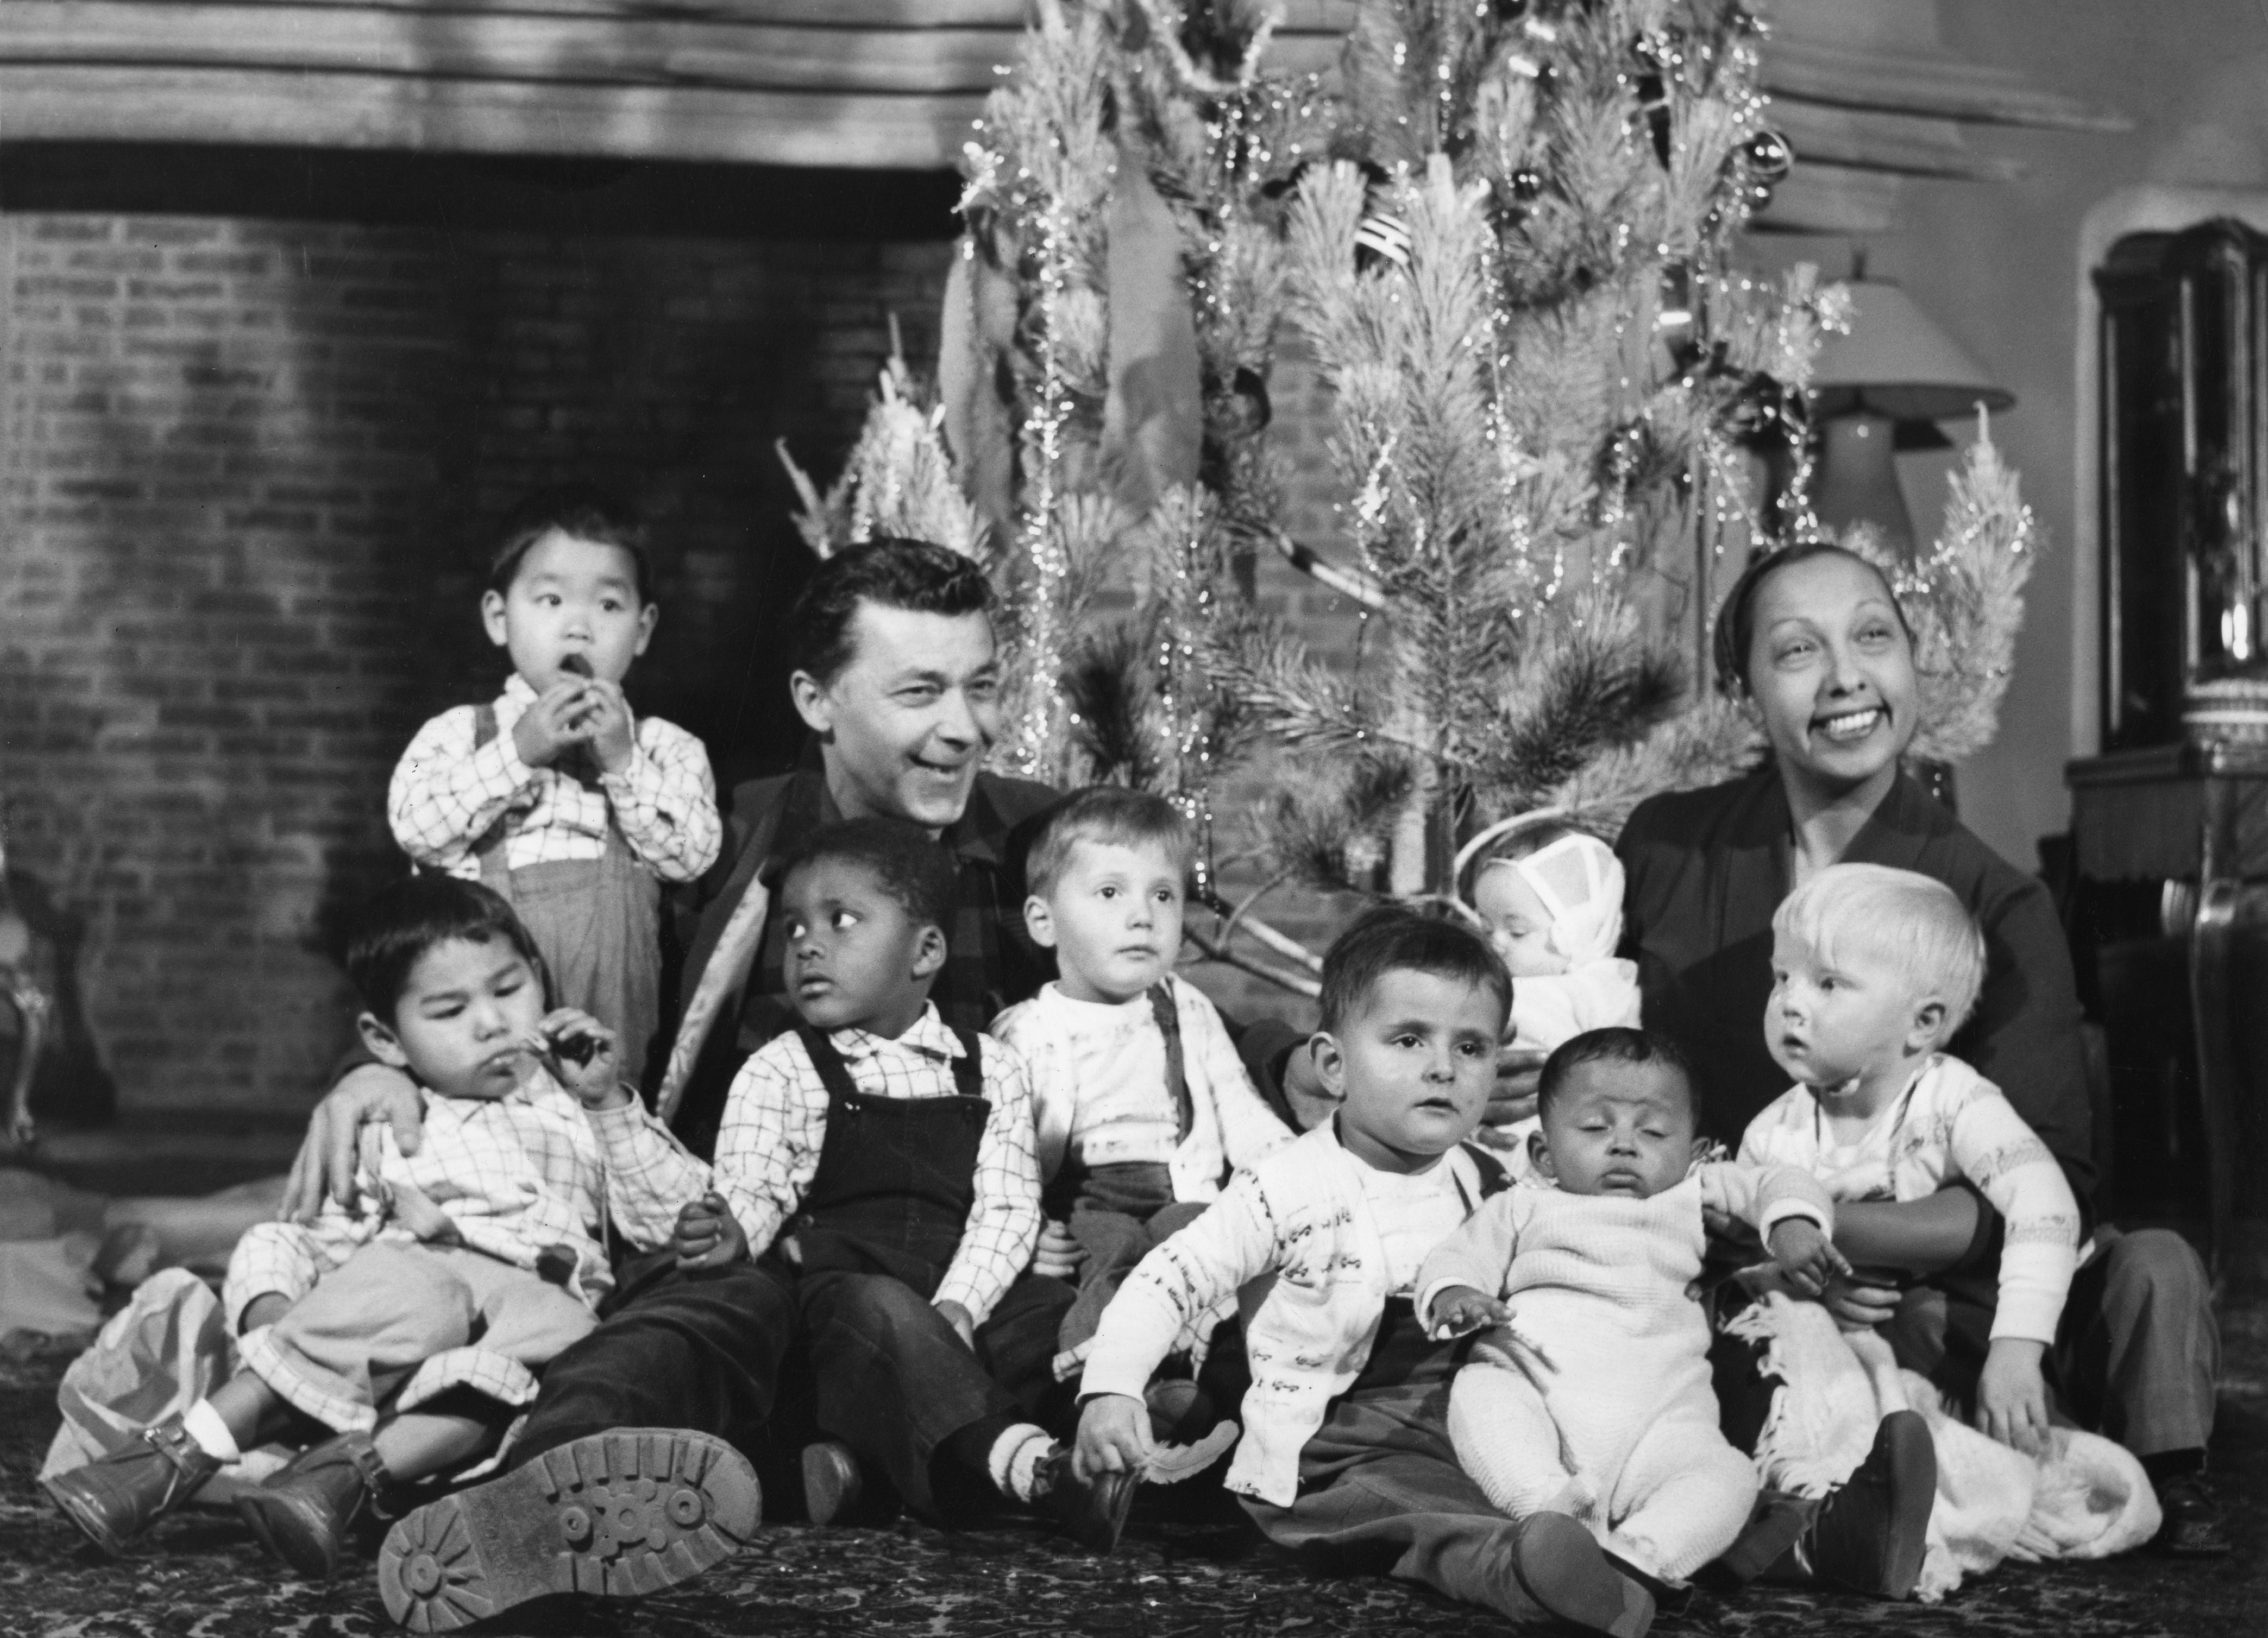 Josephine Baker with her family.